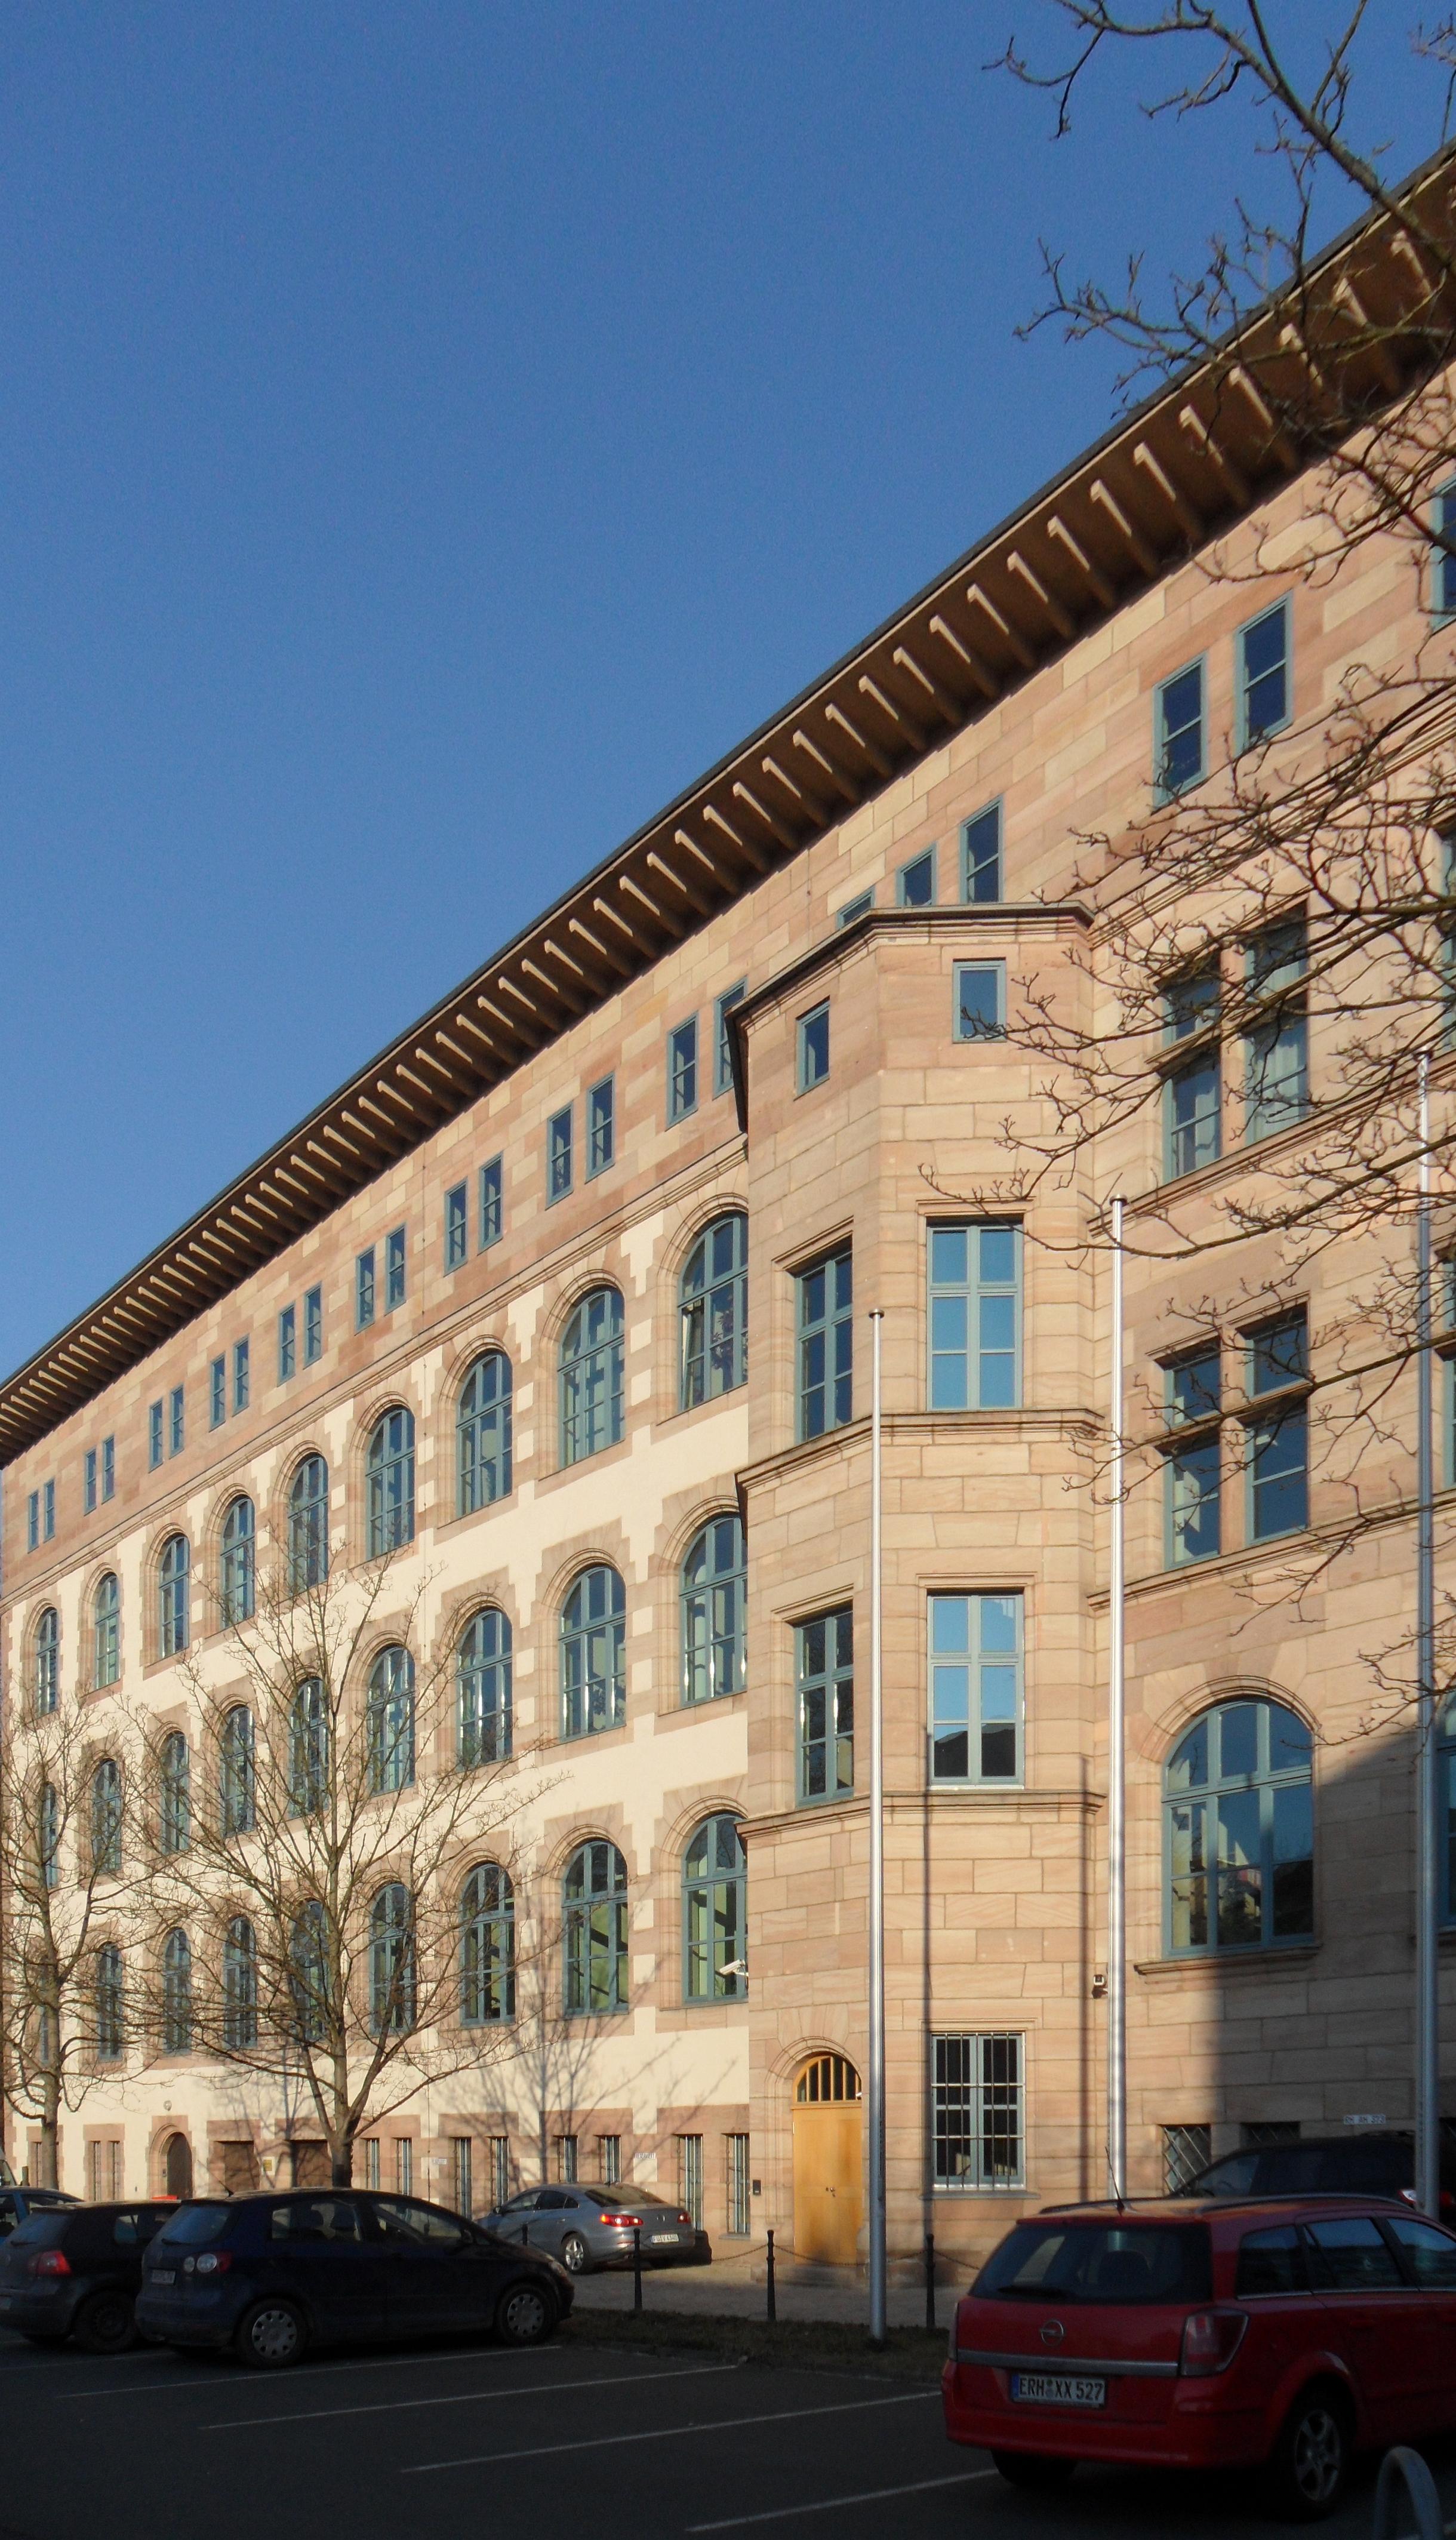 Amtsgericht Nürnberg Flaschenhofstr file amtsgericht nürnberg flaschenhofstraße 35 marienvorstadt 08 jpg